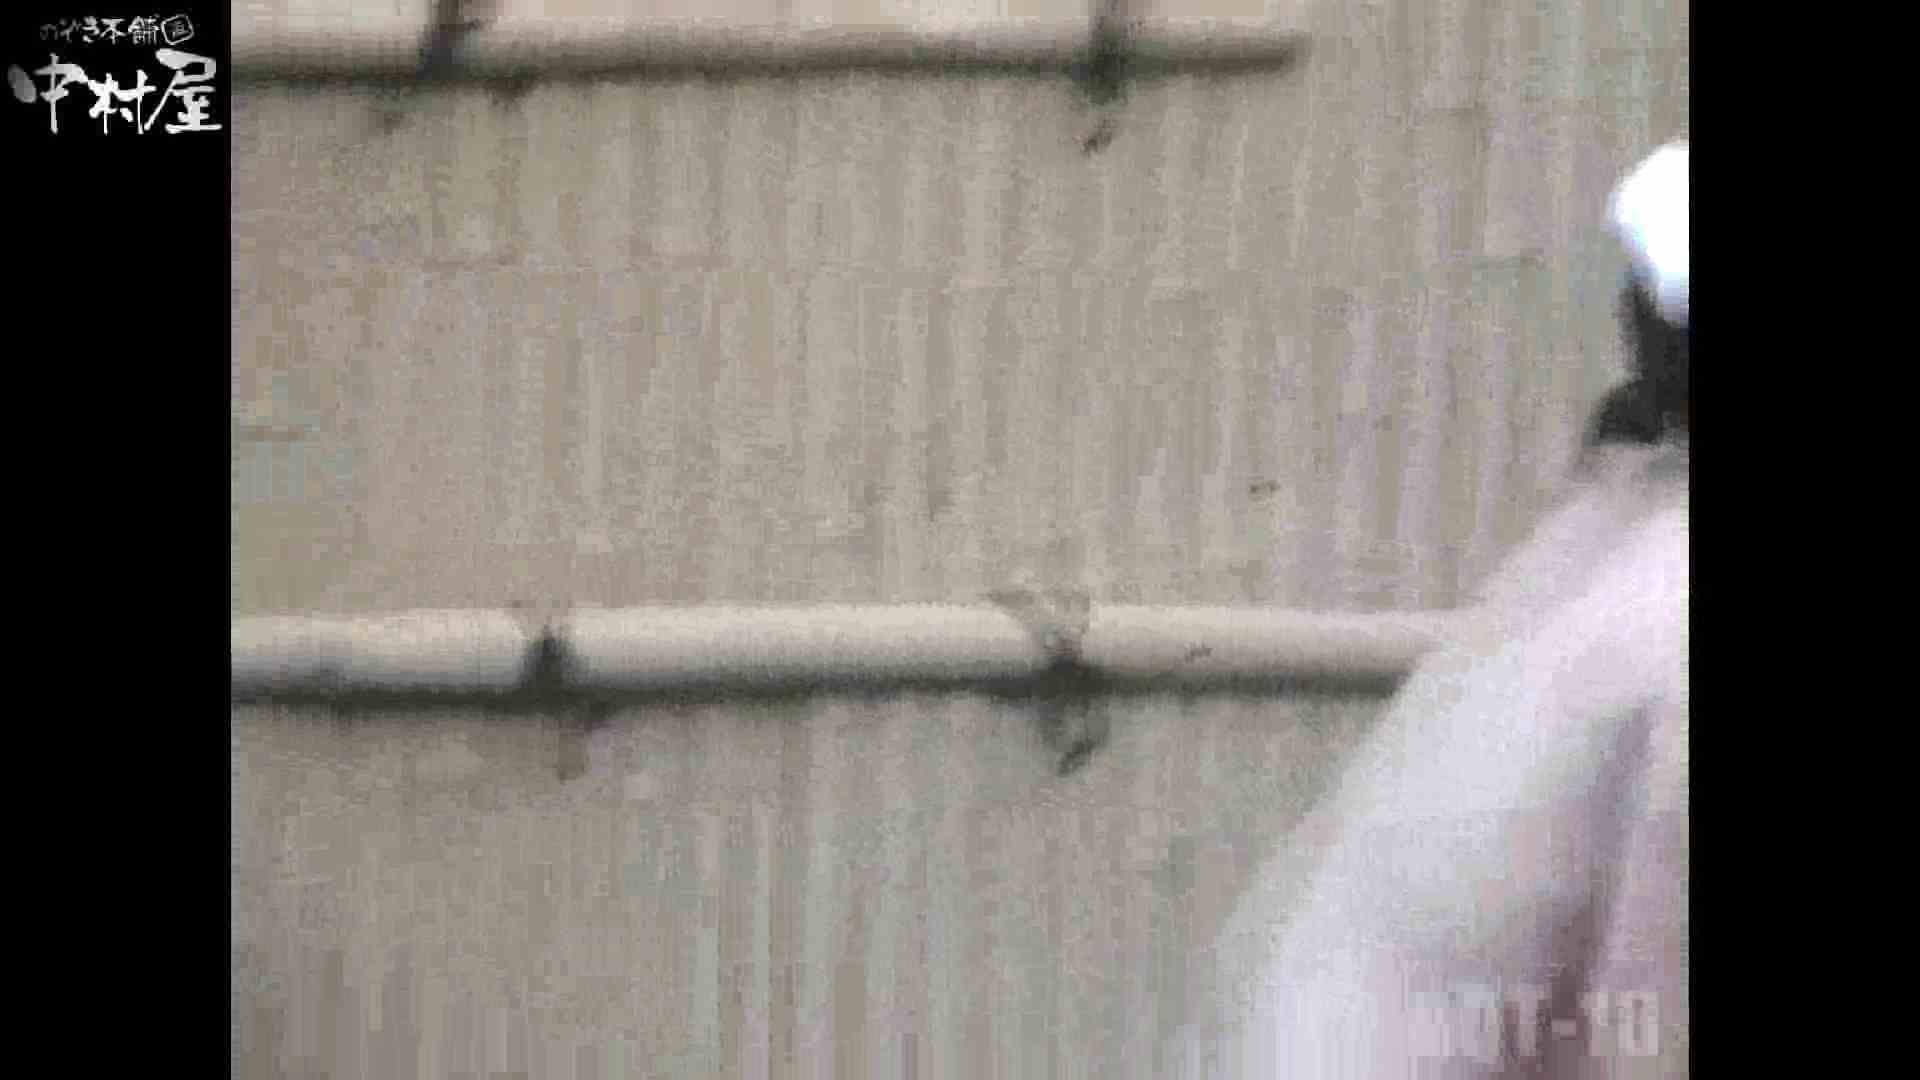 Aquaな露天風呂Vol.880潜入盗撮露天風呂十六判湯 其の六 露天 | 潜入シリーズ  95pic 92